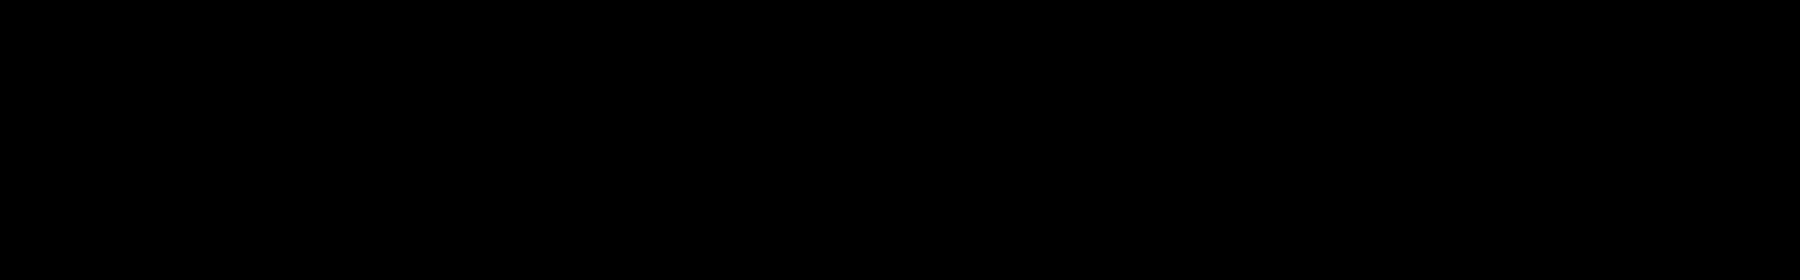 Moombahton 2 audio waveform